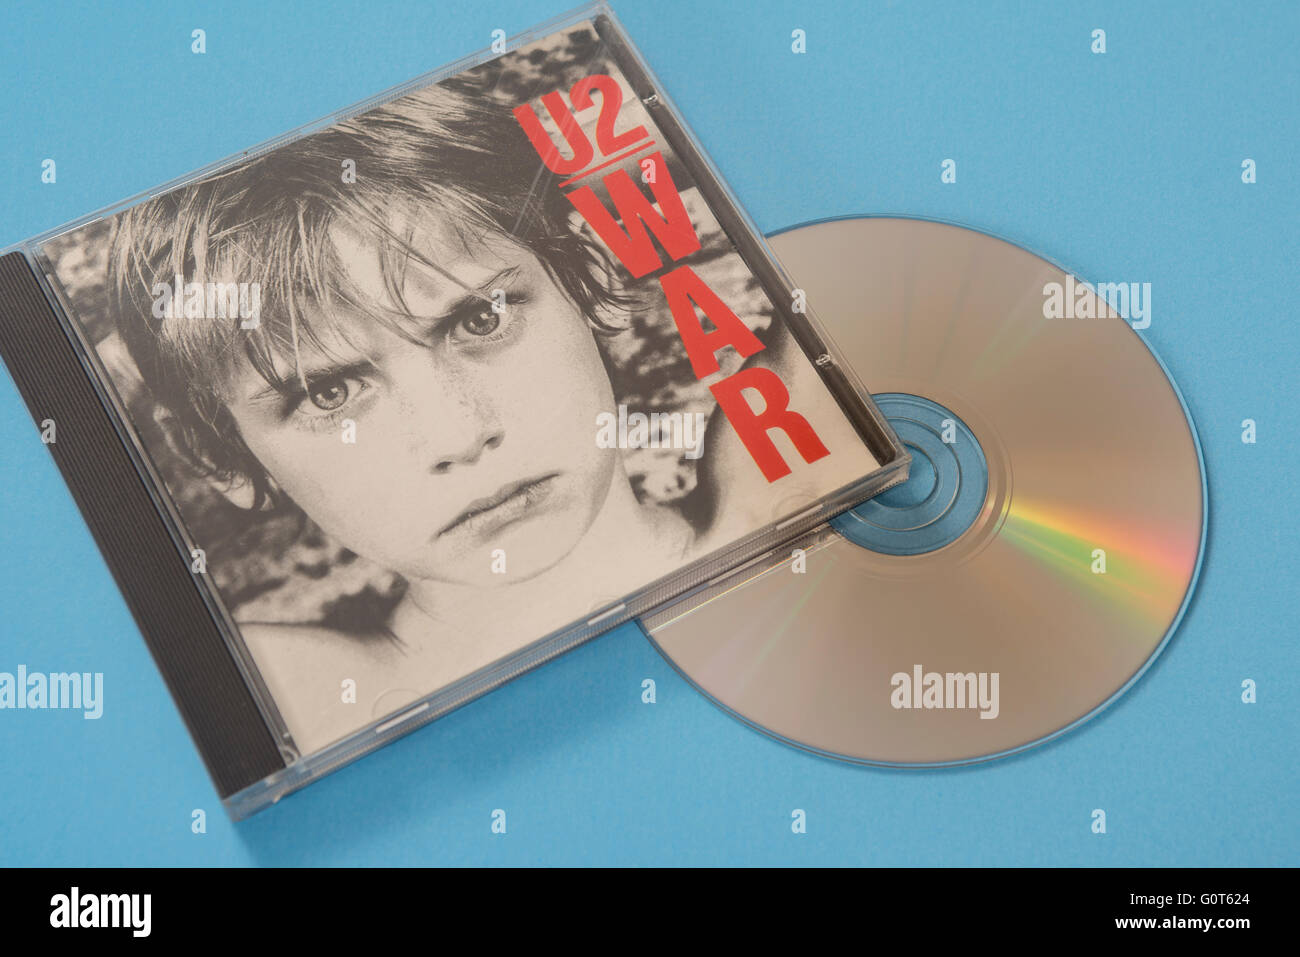 U2, War album on compact disc - Stock Image